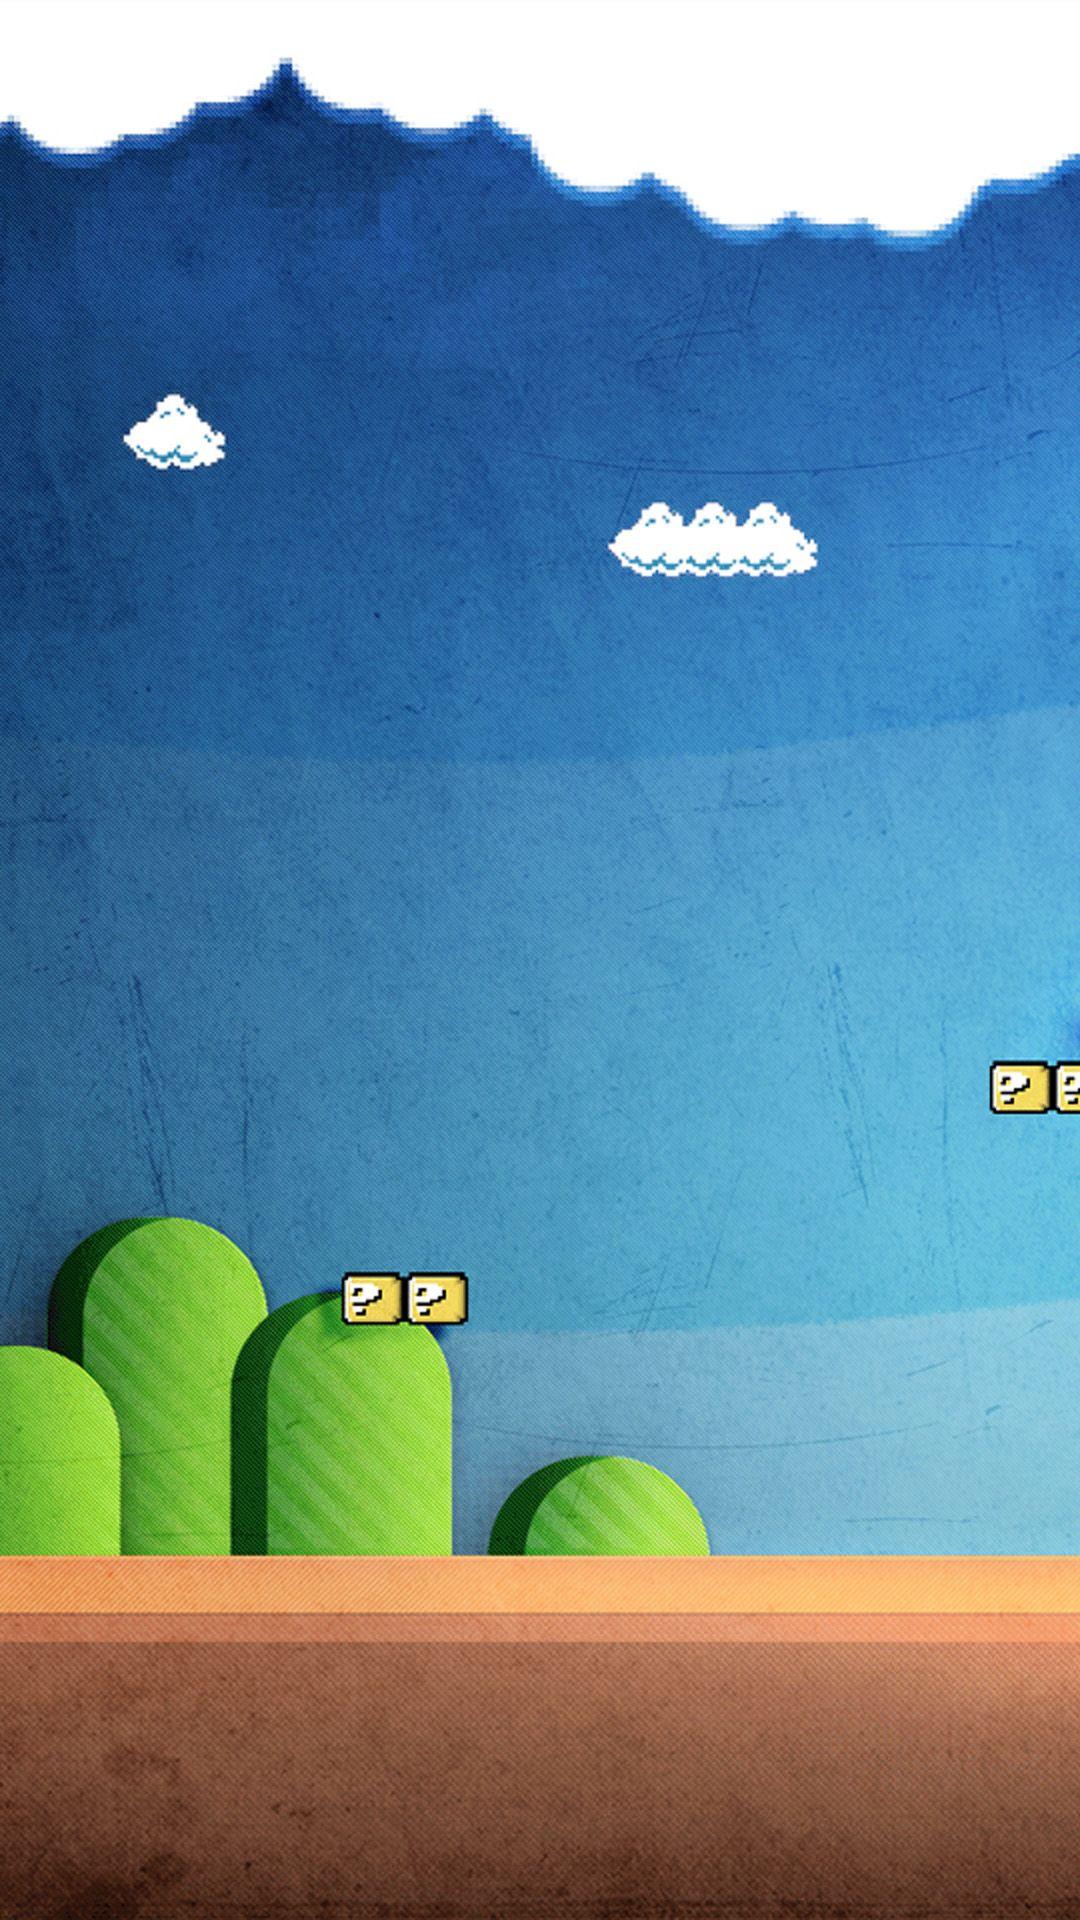 Super Mario wallpaper in 2019   Cellphone wallpaper ...